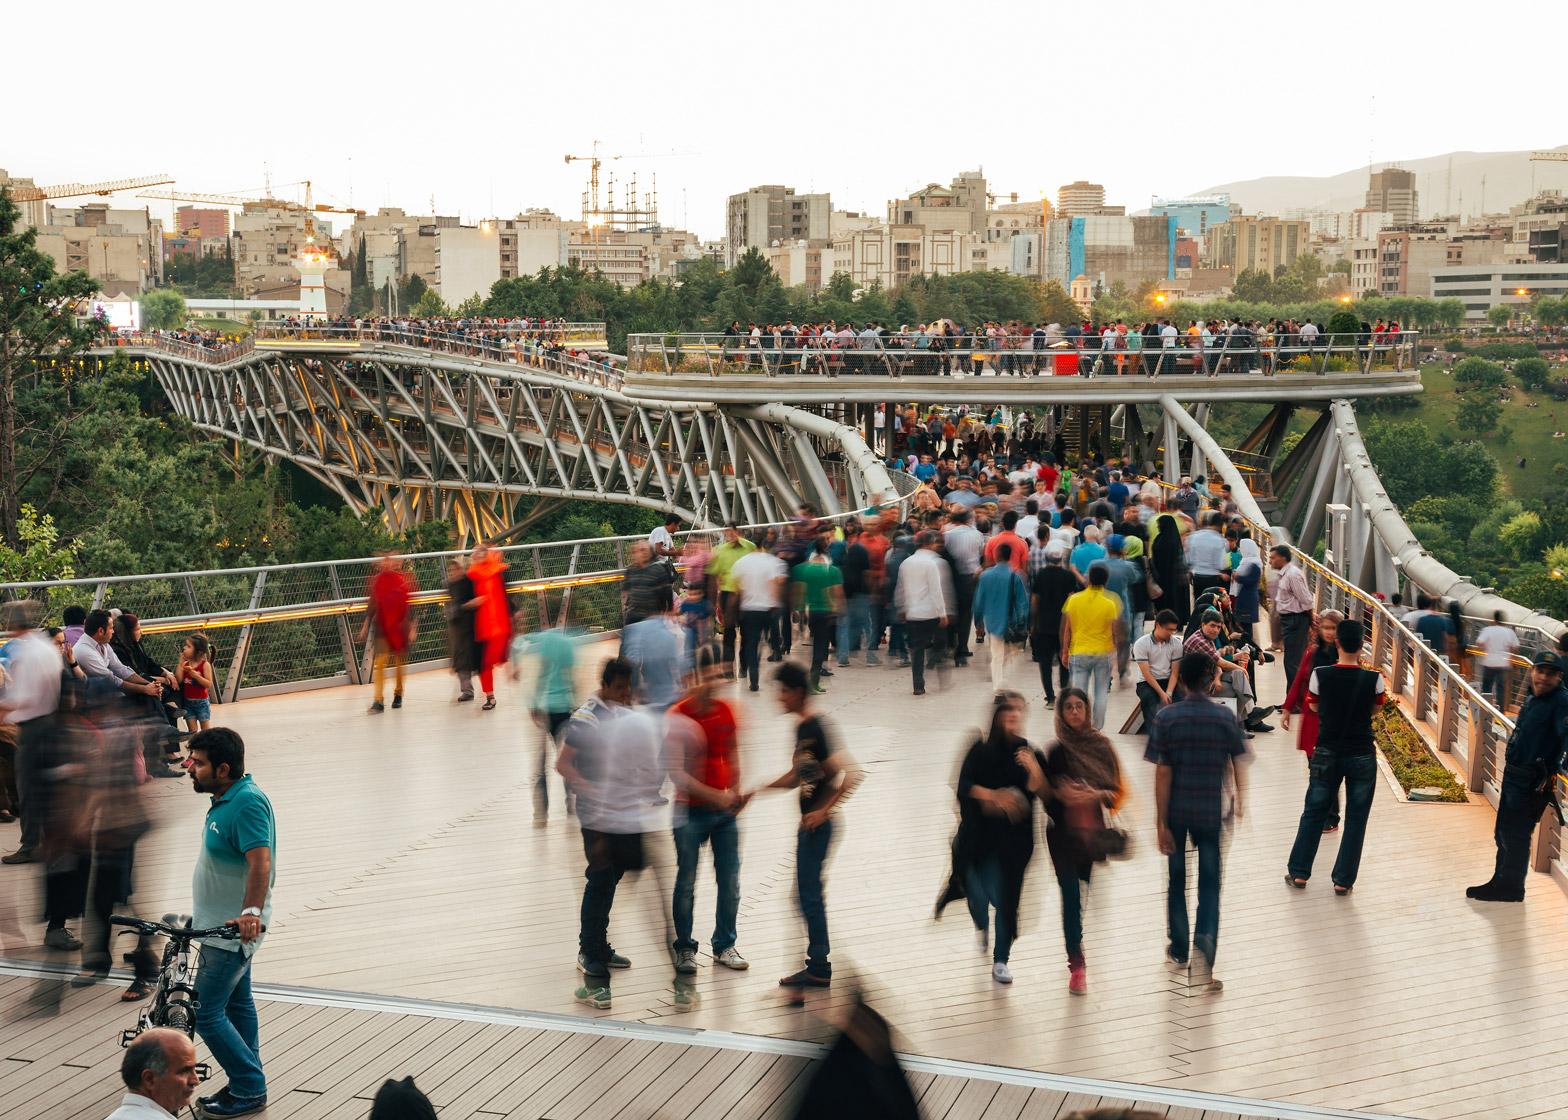 Tabiat Bridge by Diba Tensile Architecture in Tehran, Iran